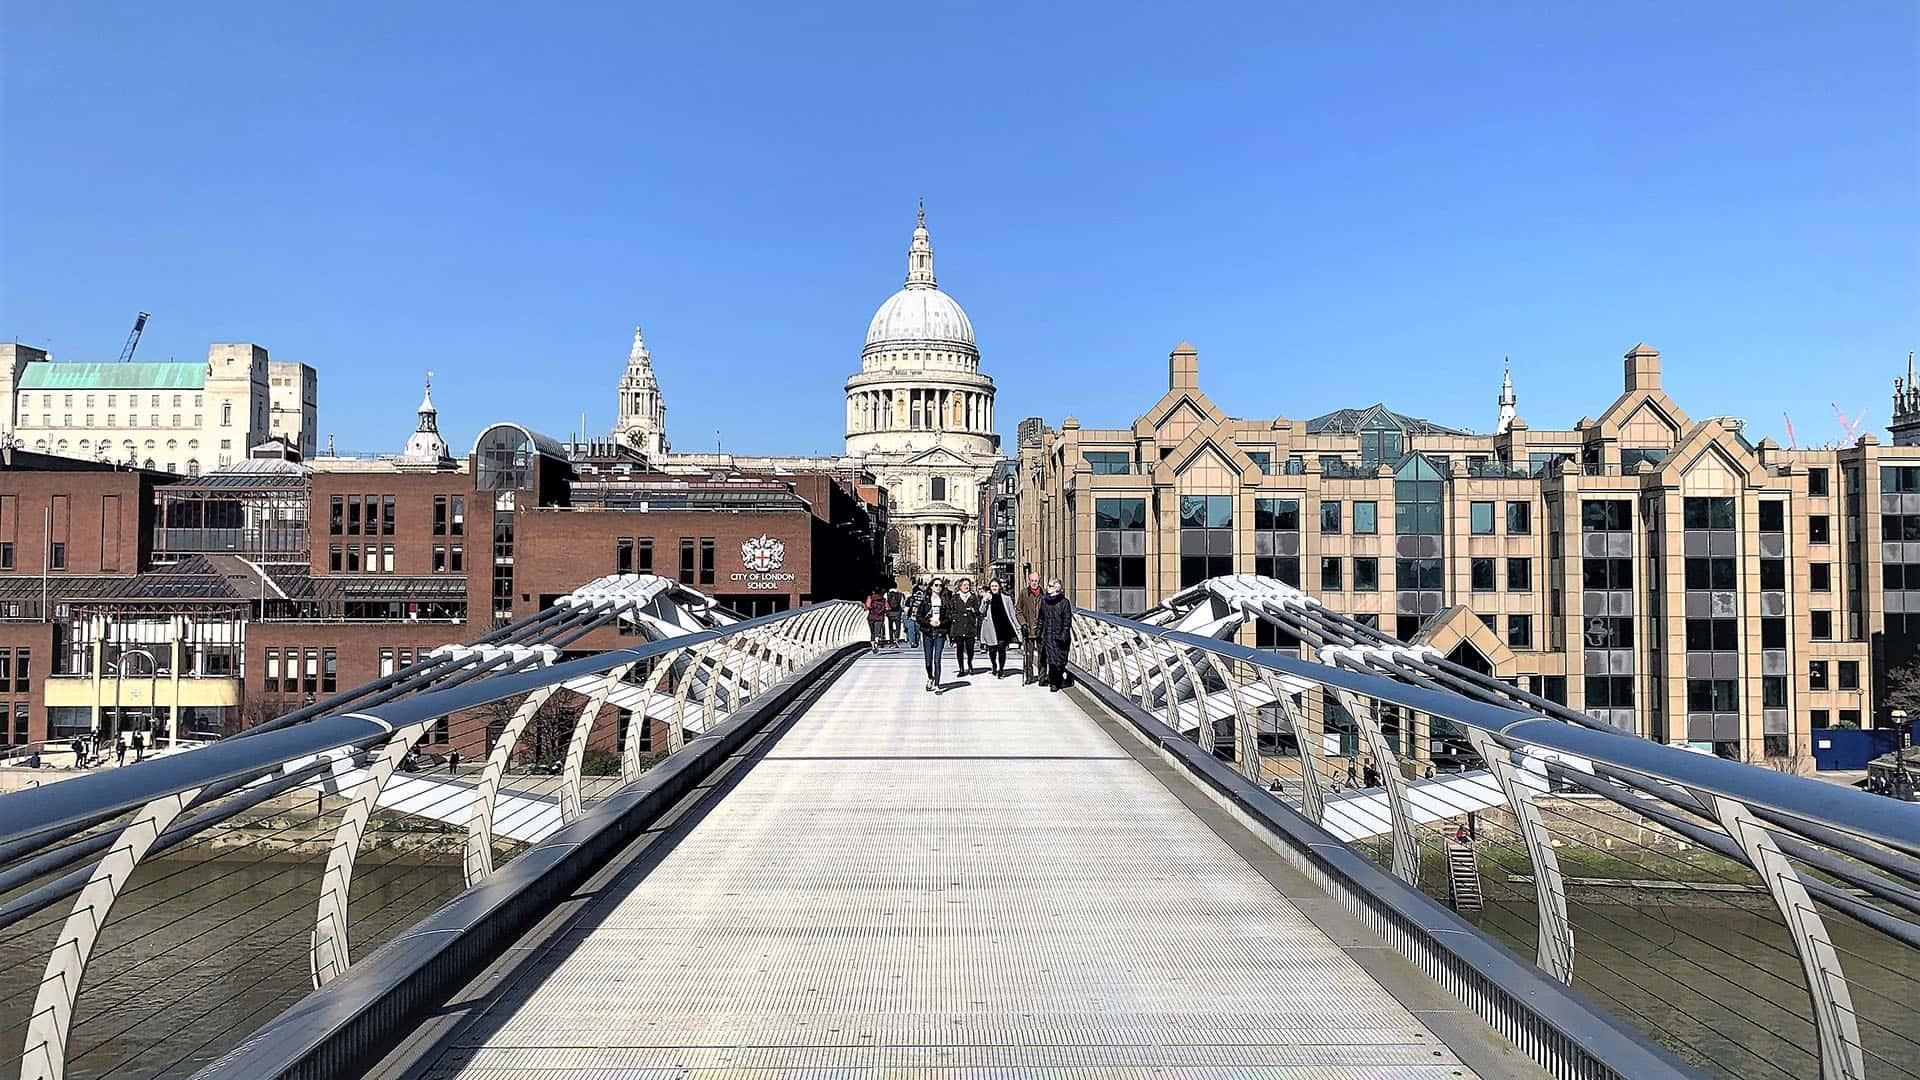 Crossing the River Thames – London Virtual Tour